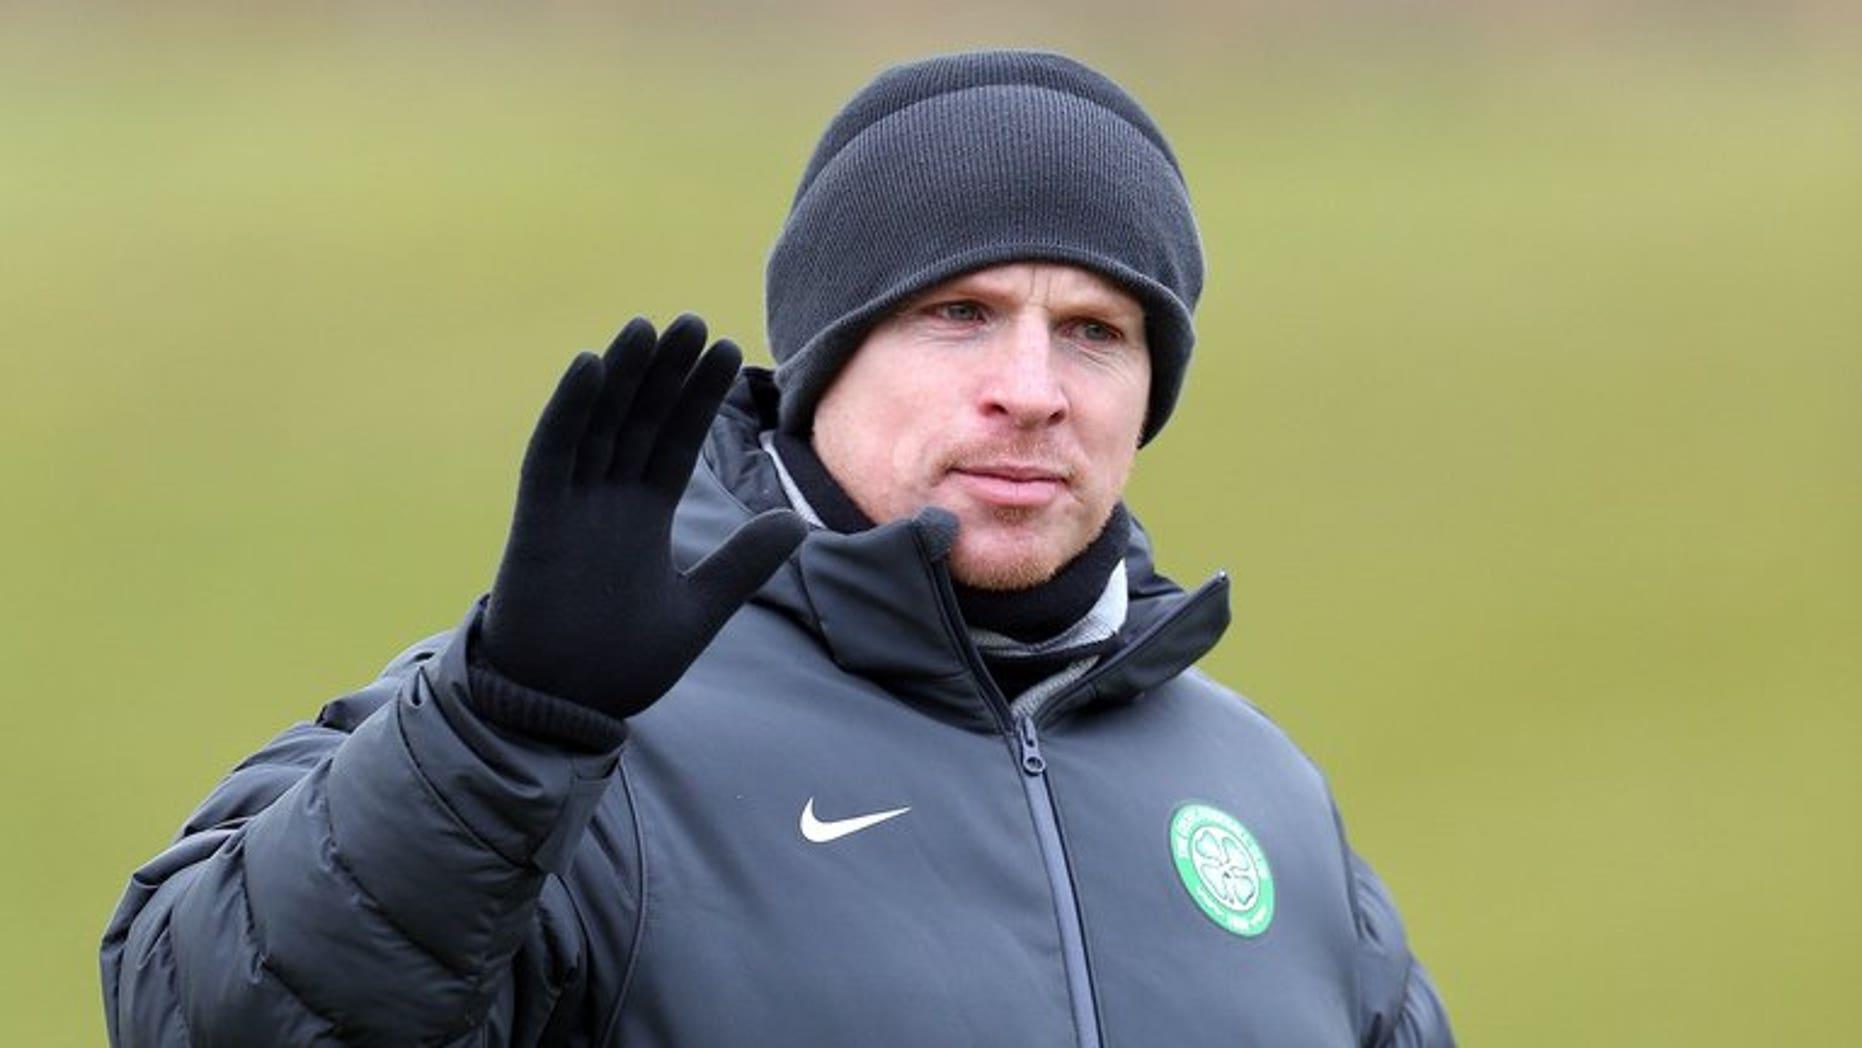 Celtic's manager Neil Lennon leads a training session at Lennoxtown Training facility, near Glasgow, Scotland, on February 11, 2013.